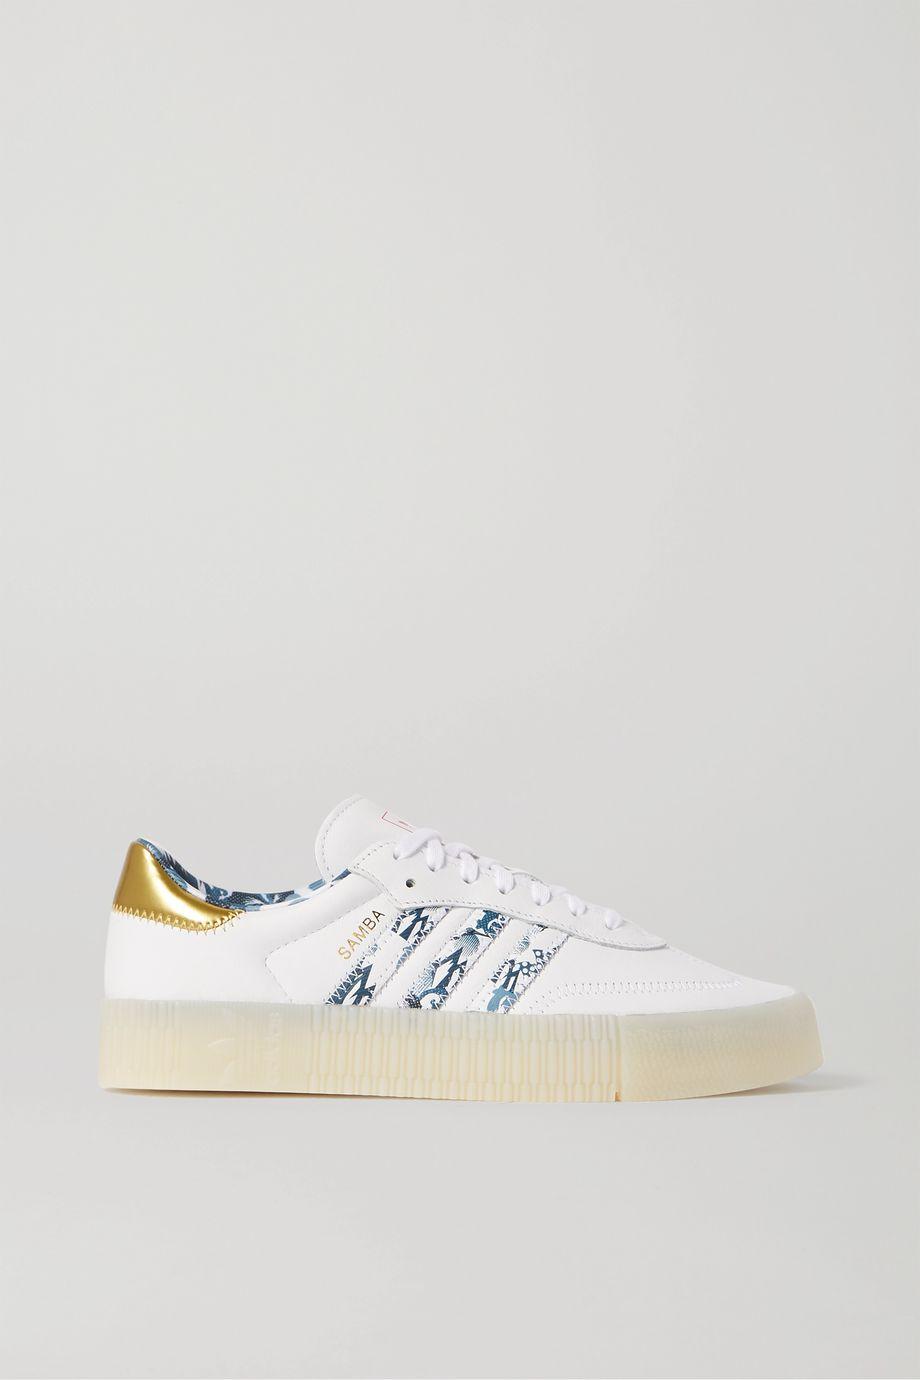 adidas Originals SambaRose printed leather platform sneakers